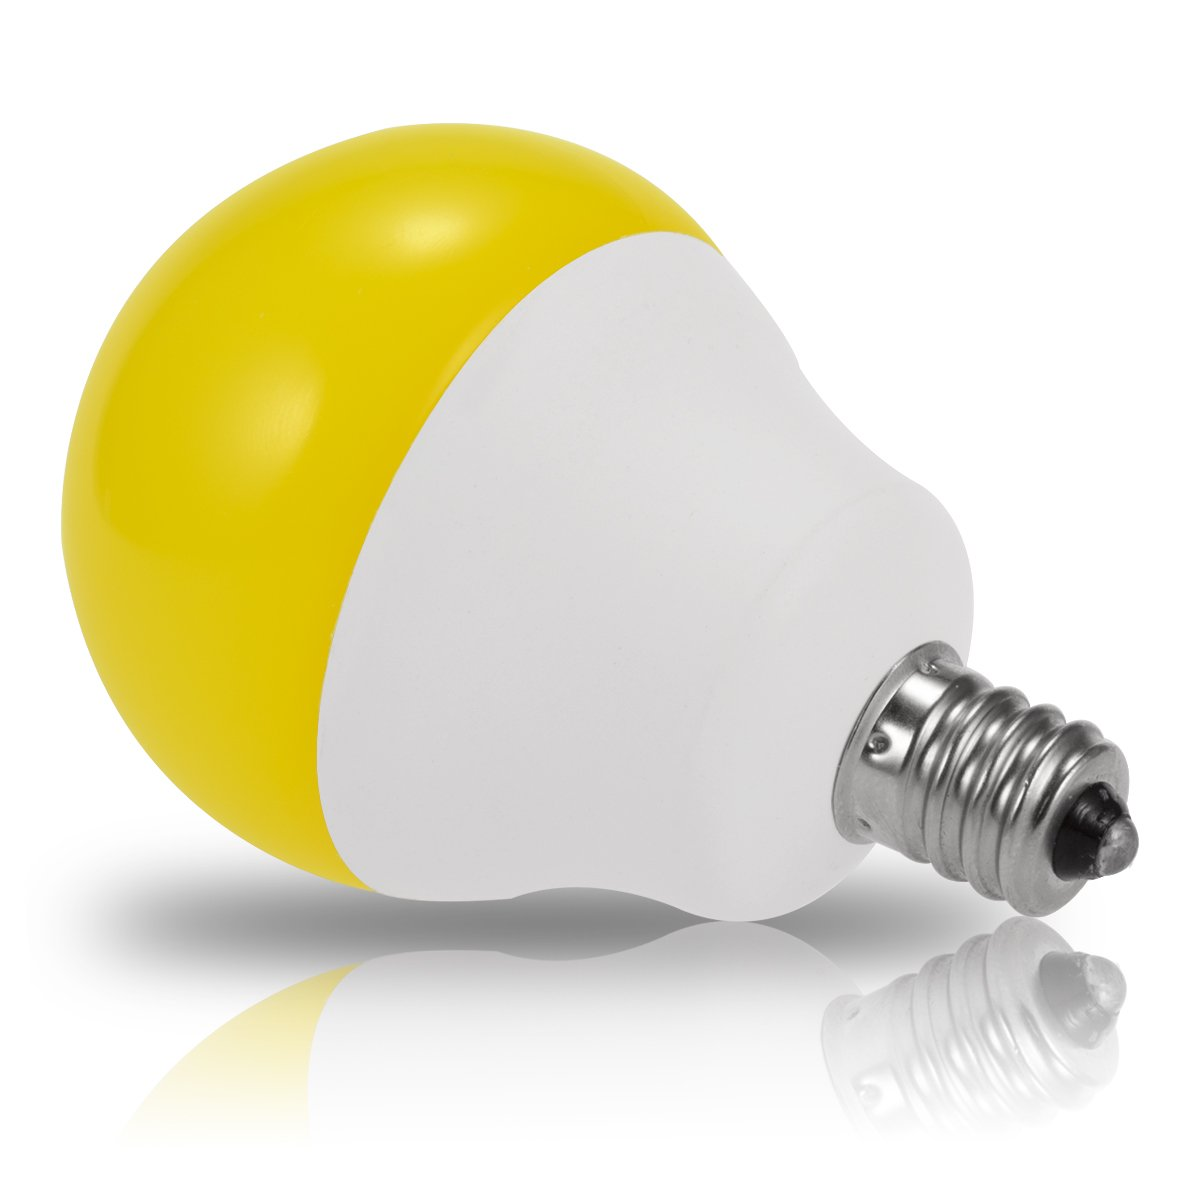 jandcase LED amarillo luz bombillas, bombilla de bajo consumo (esférica, 5 W, equivalente a 40 W, Incandescente, E12 candelabro Base, G14 bombillas para ...